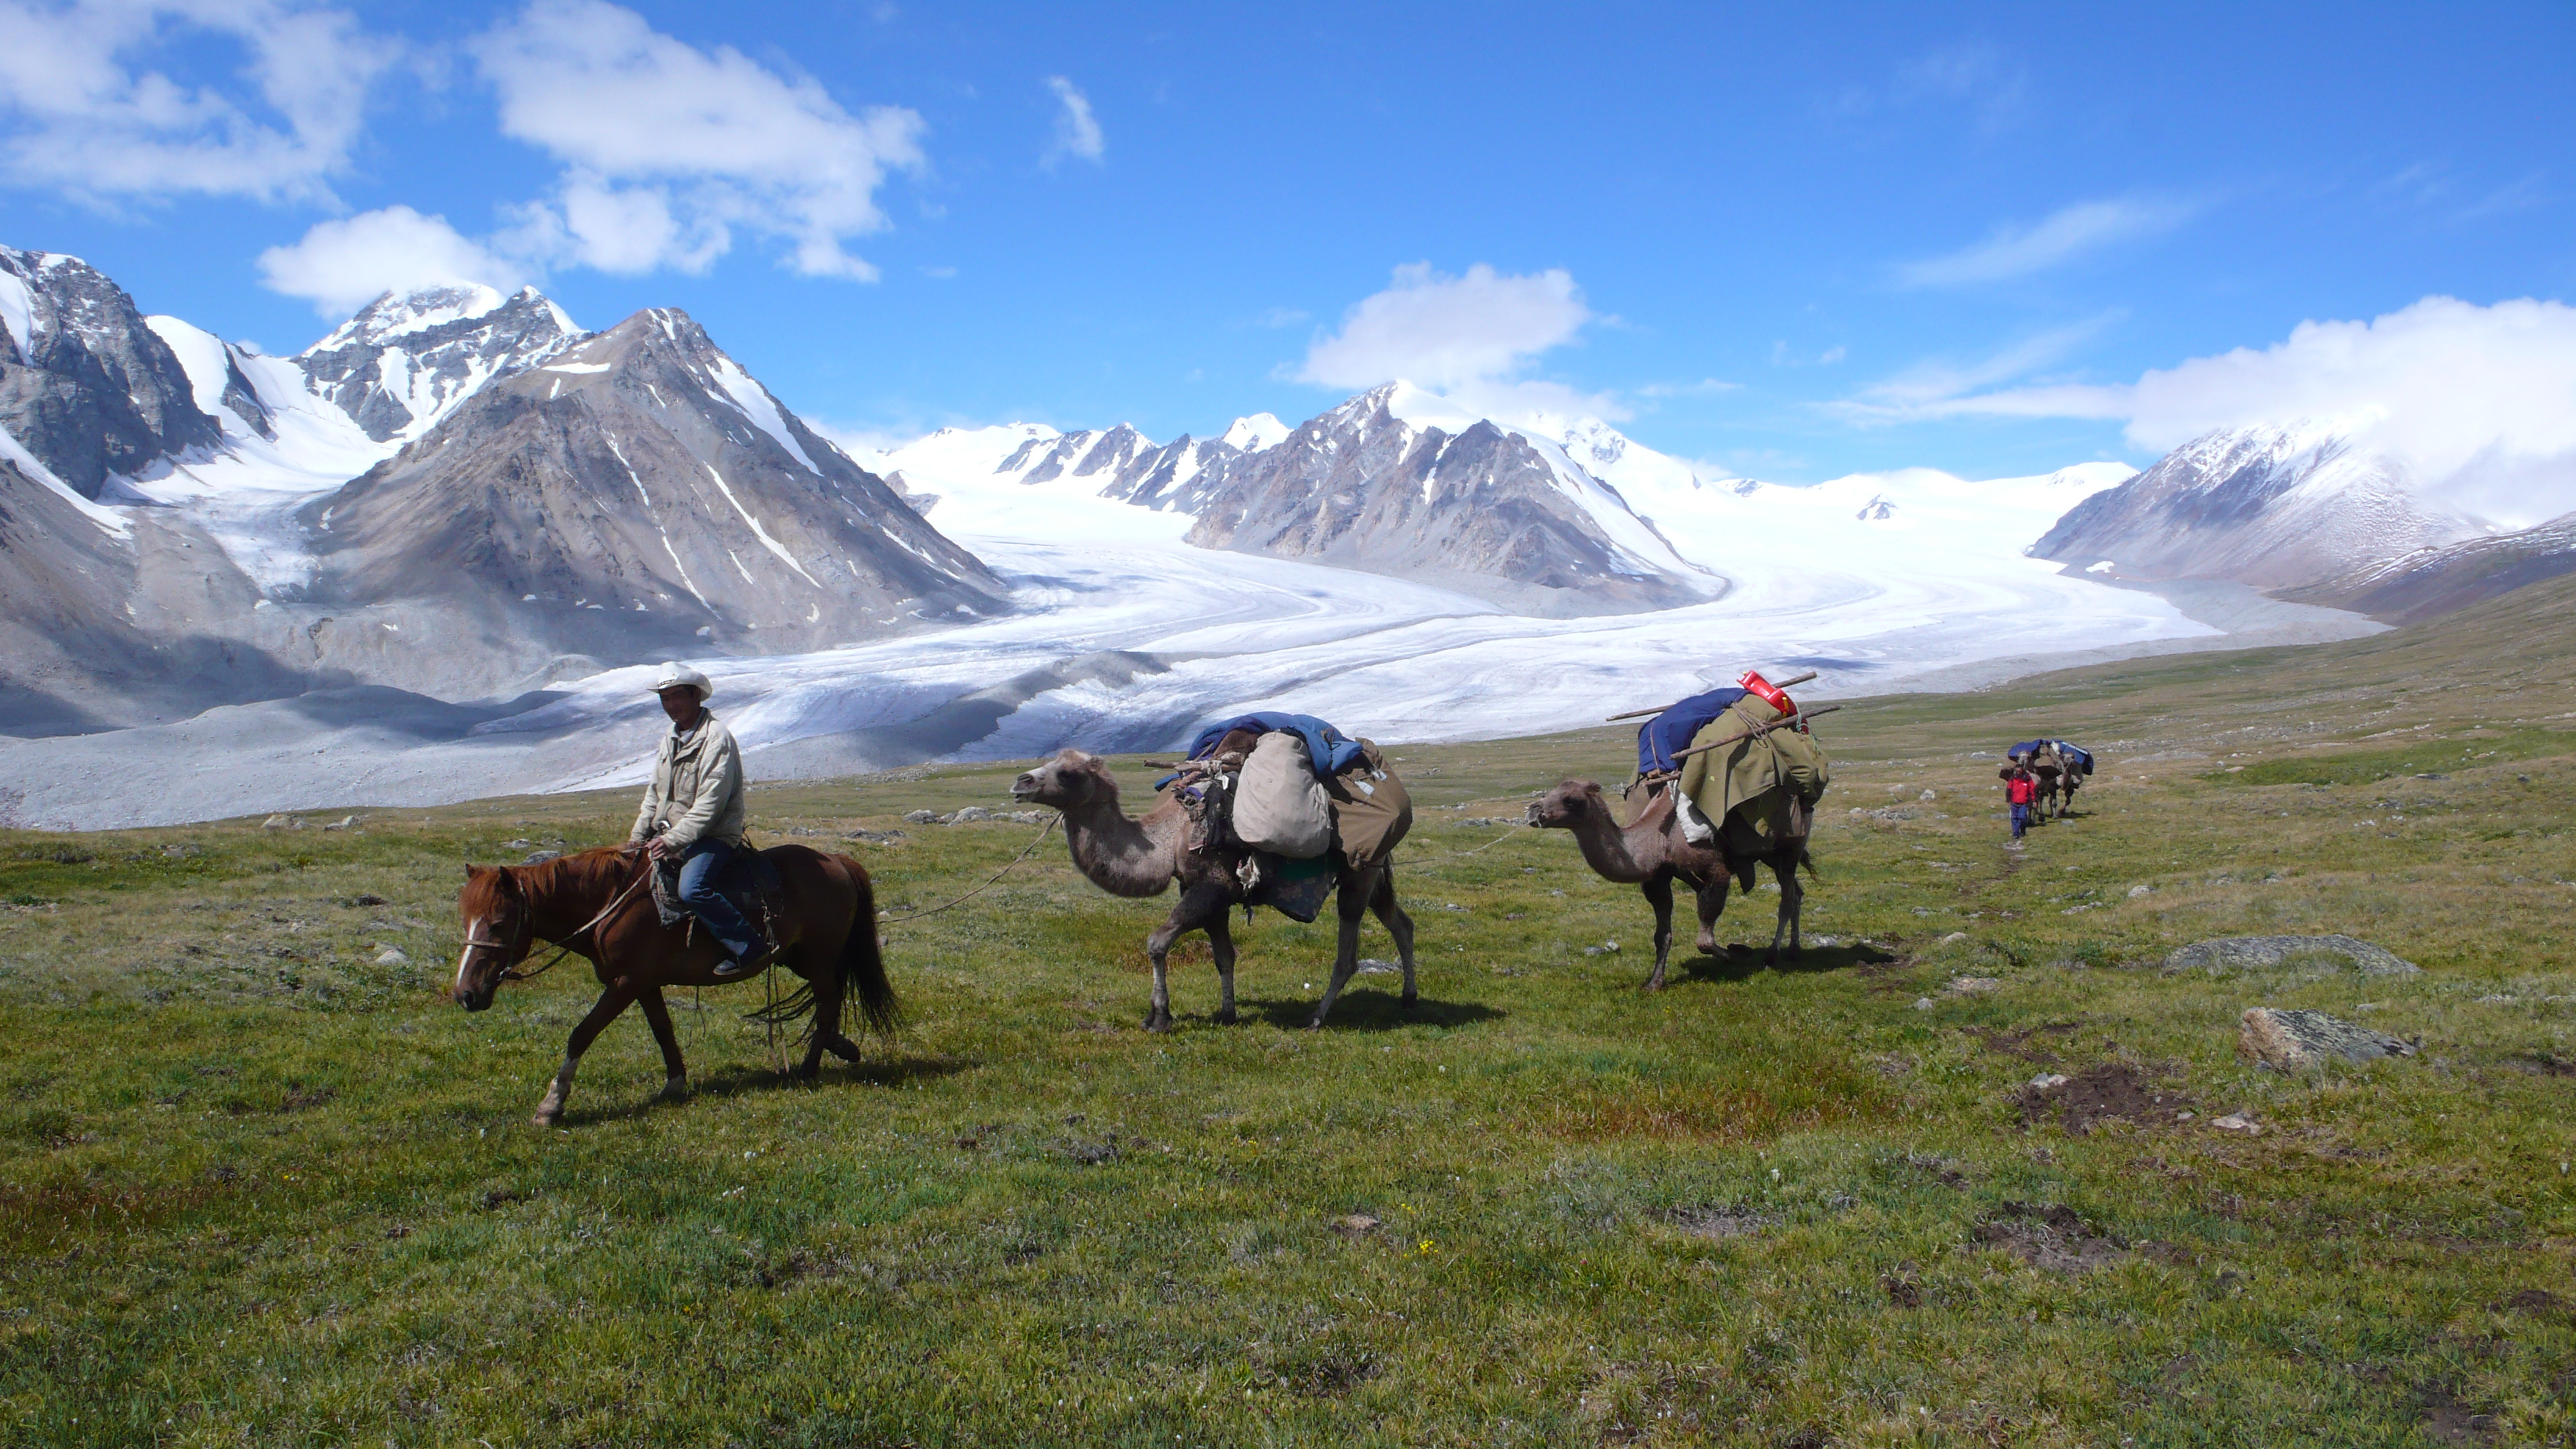 Mongolie altaï